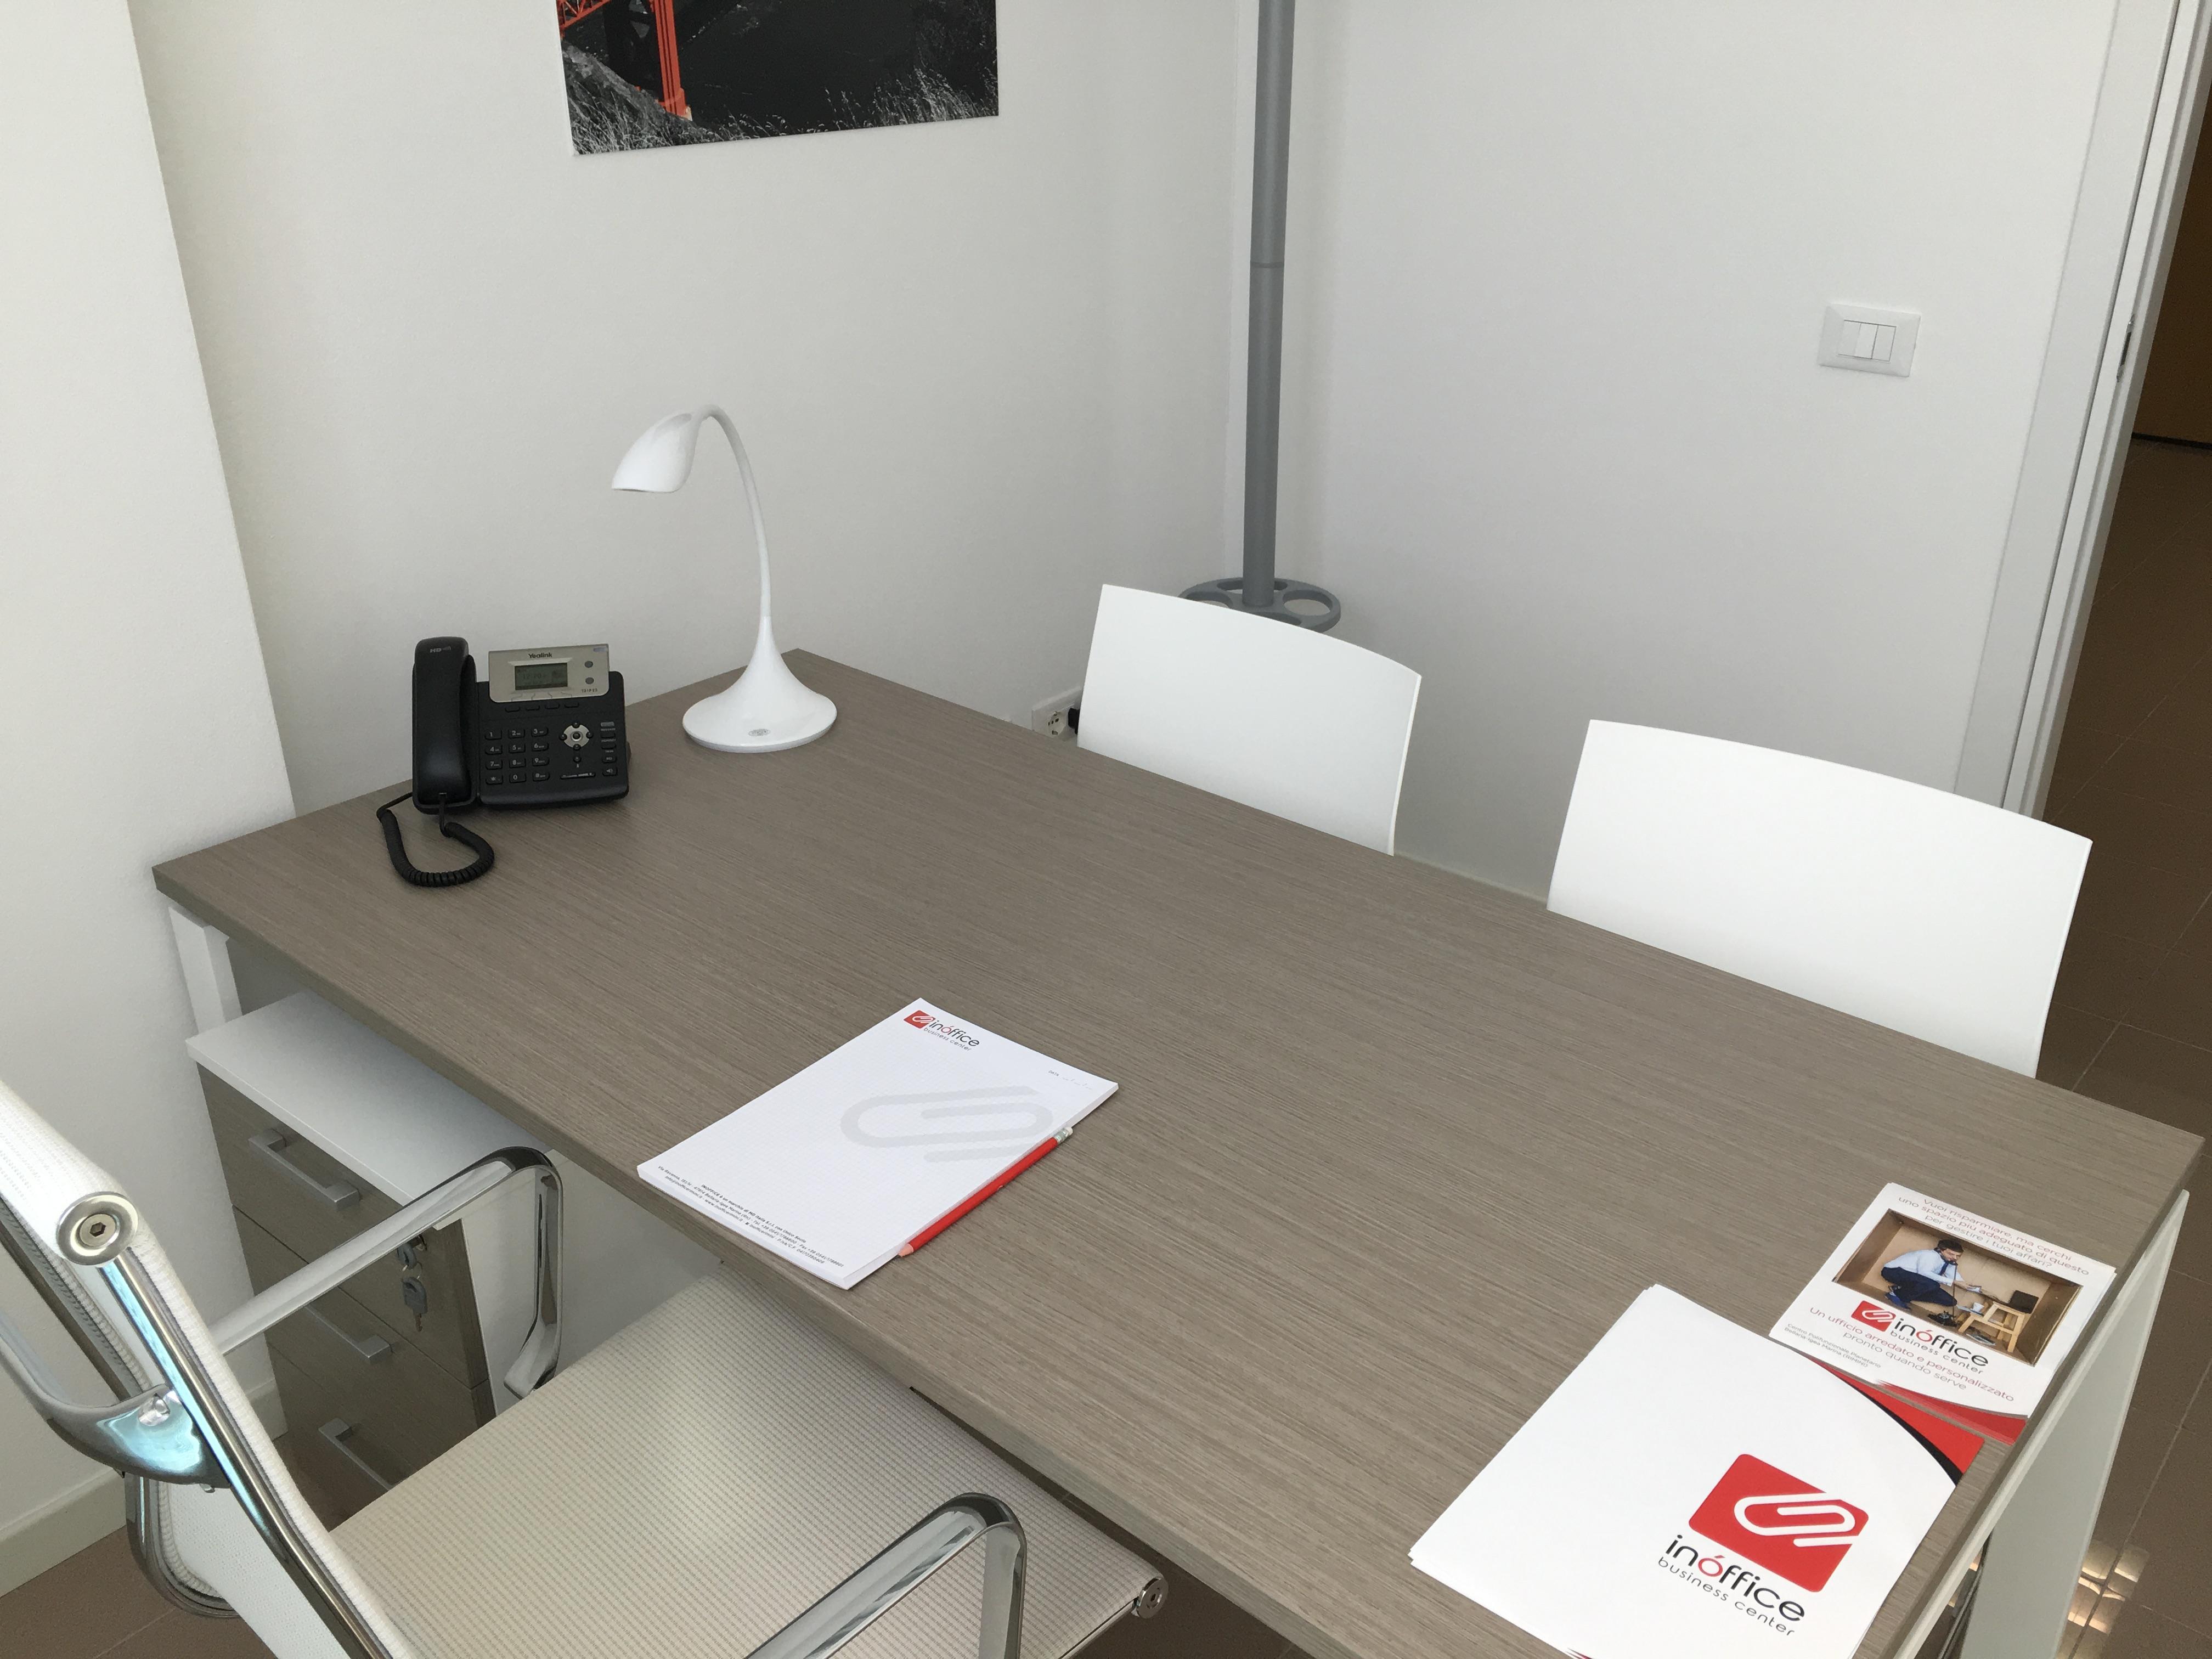 Disposizione Scrivania Ufficio : Uffici arredati inóffice business center a bellaria igea marina